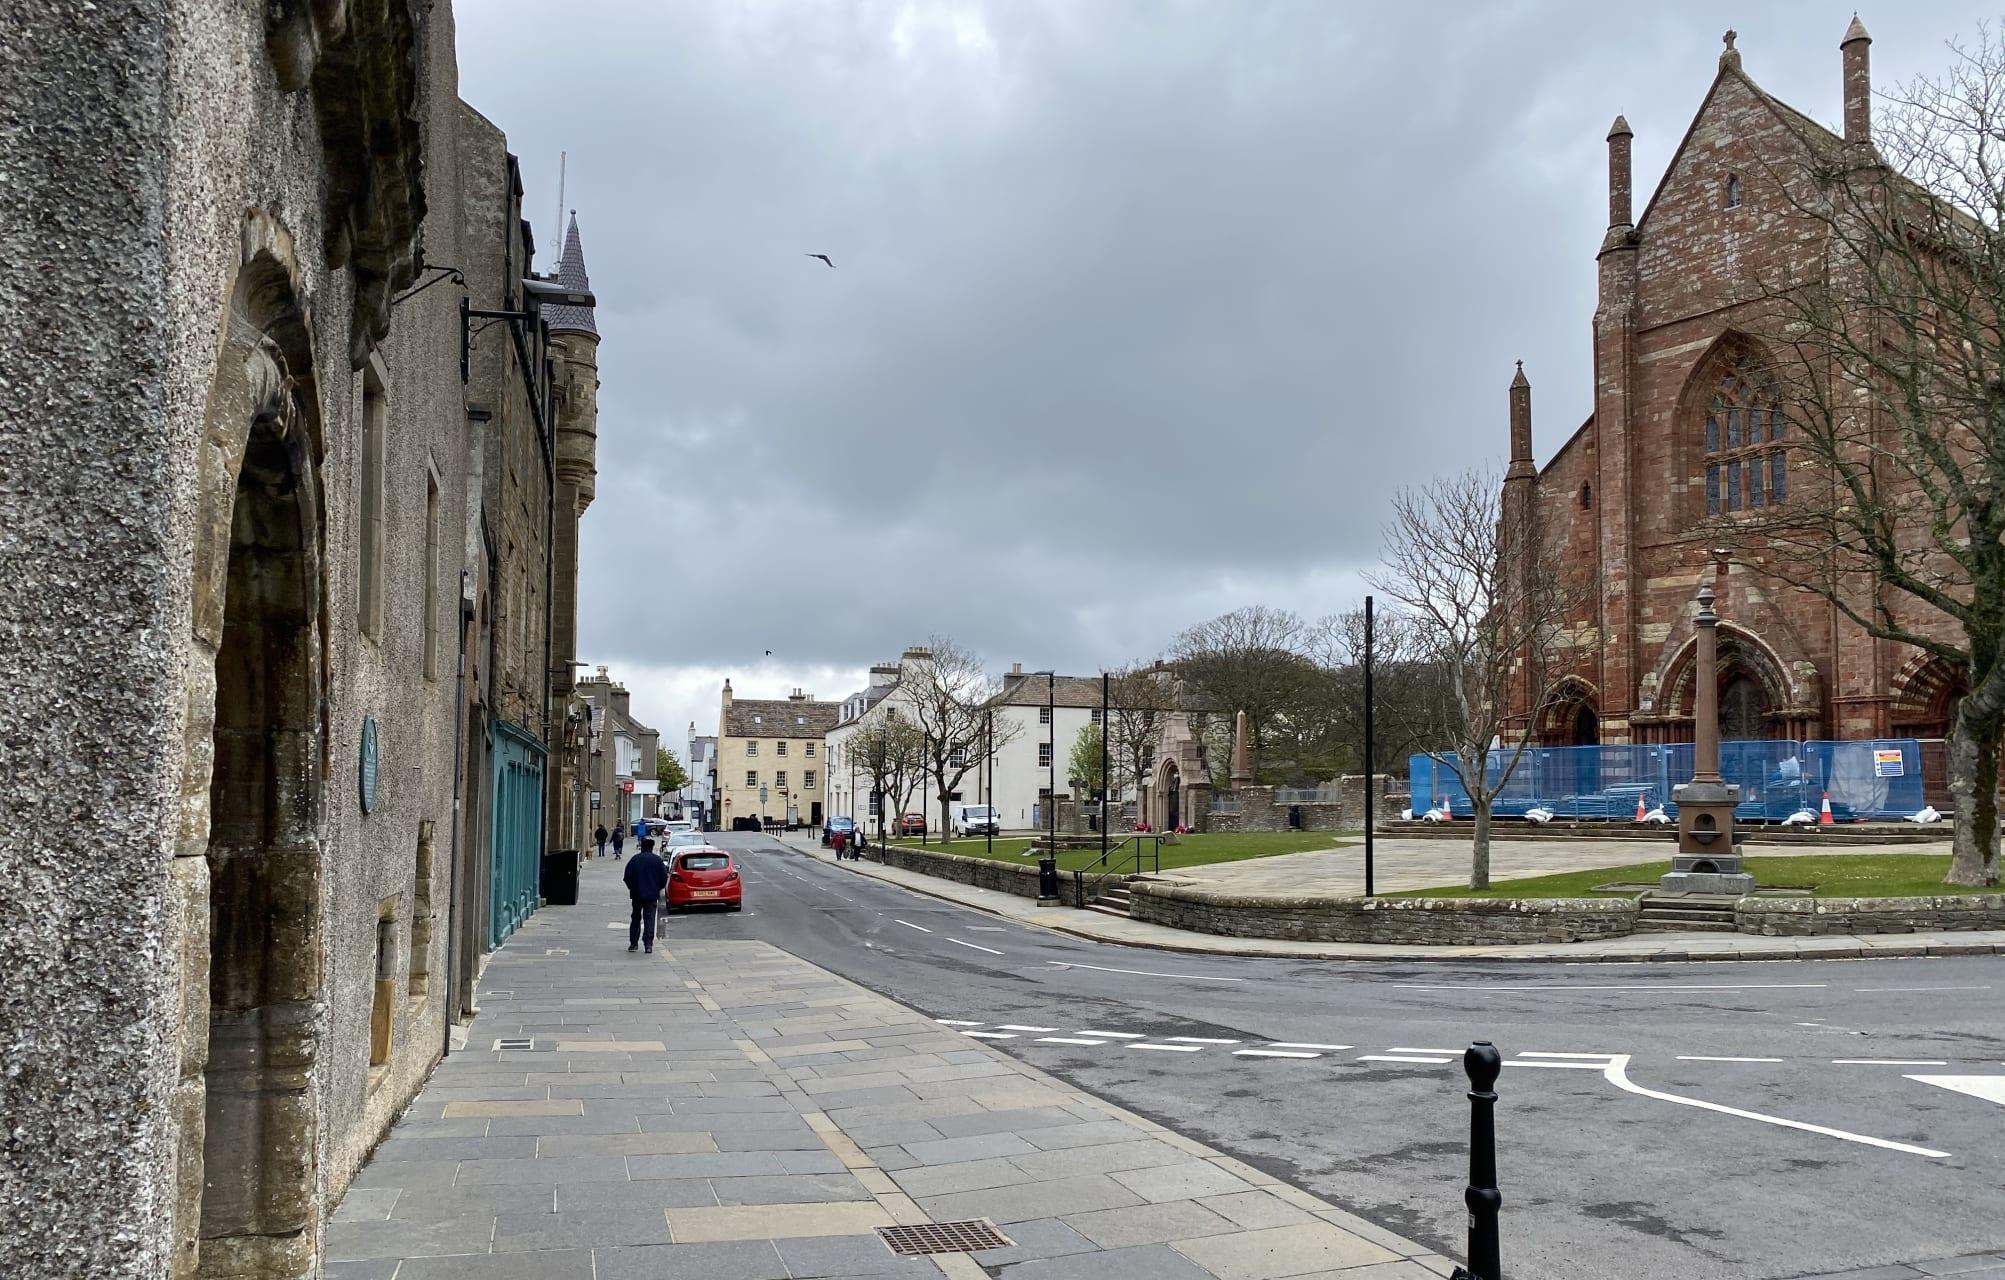 Orkney - Walking Tour of Kirkwall, Part 2